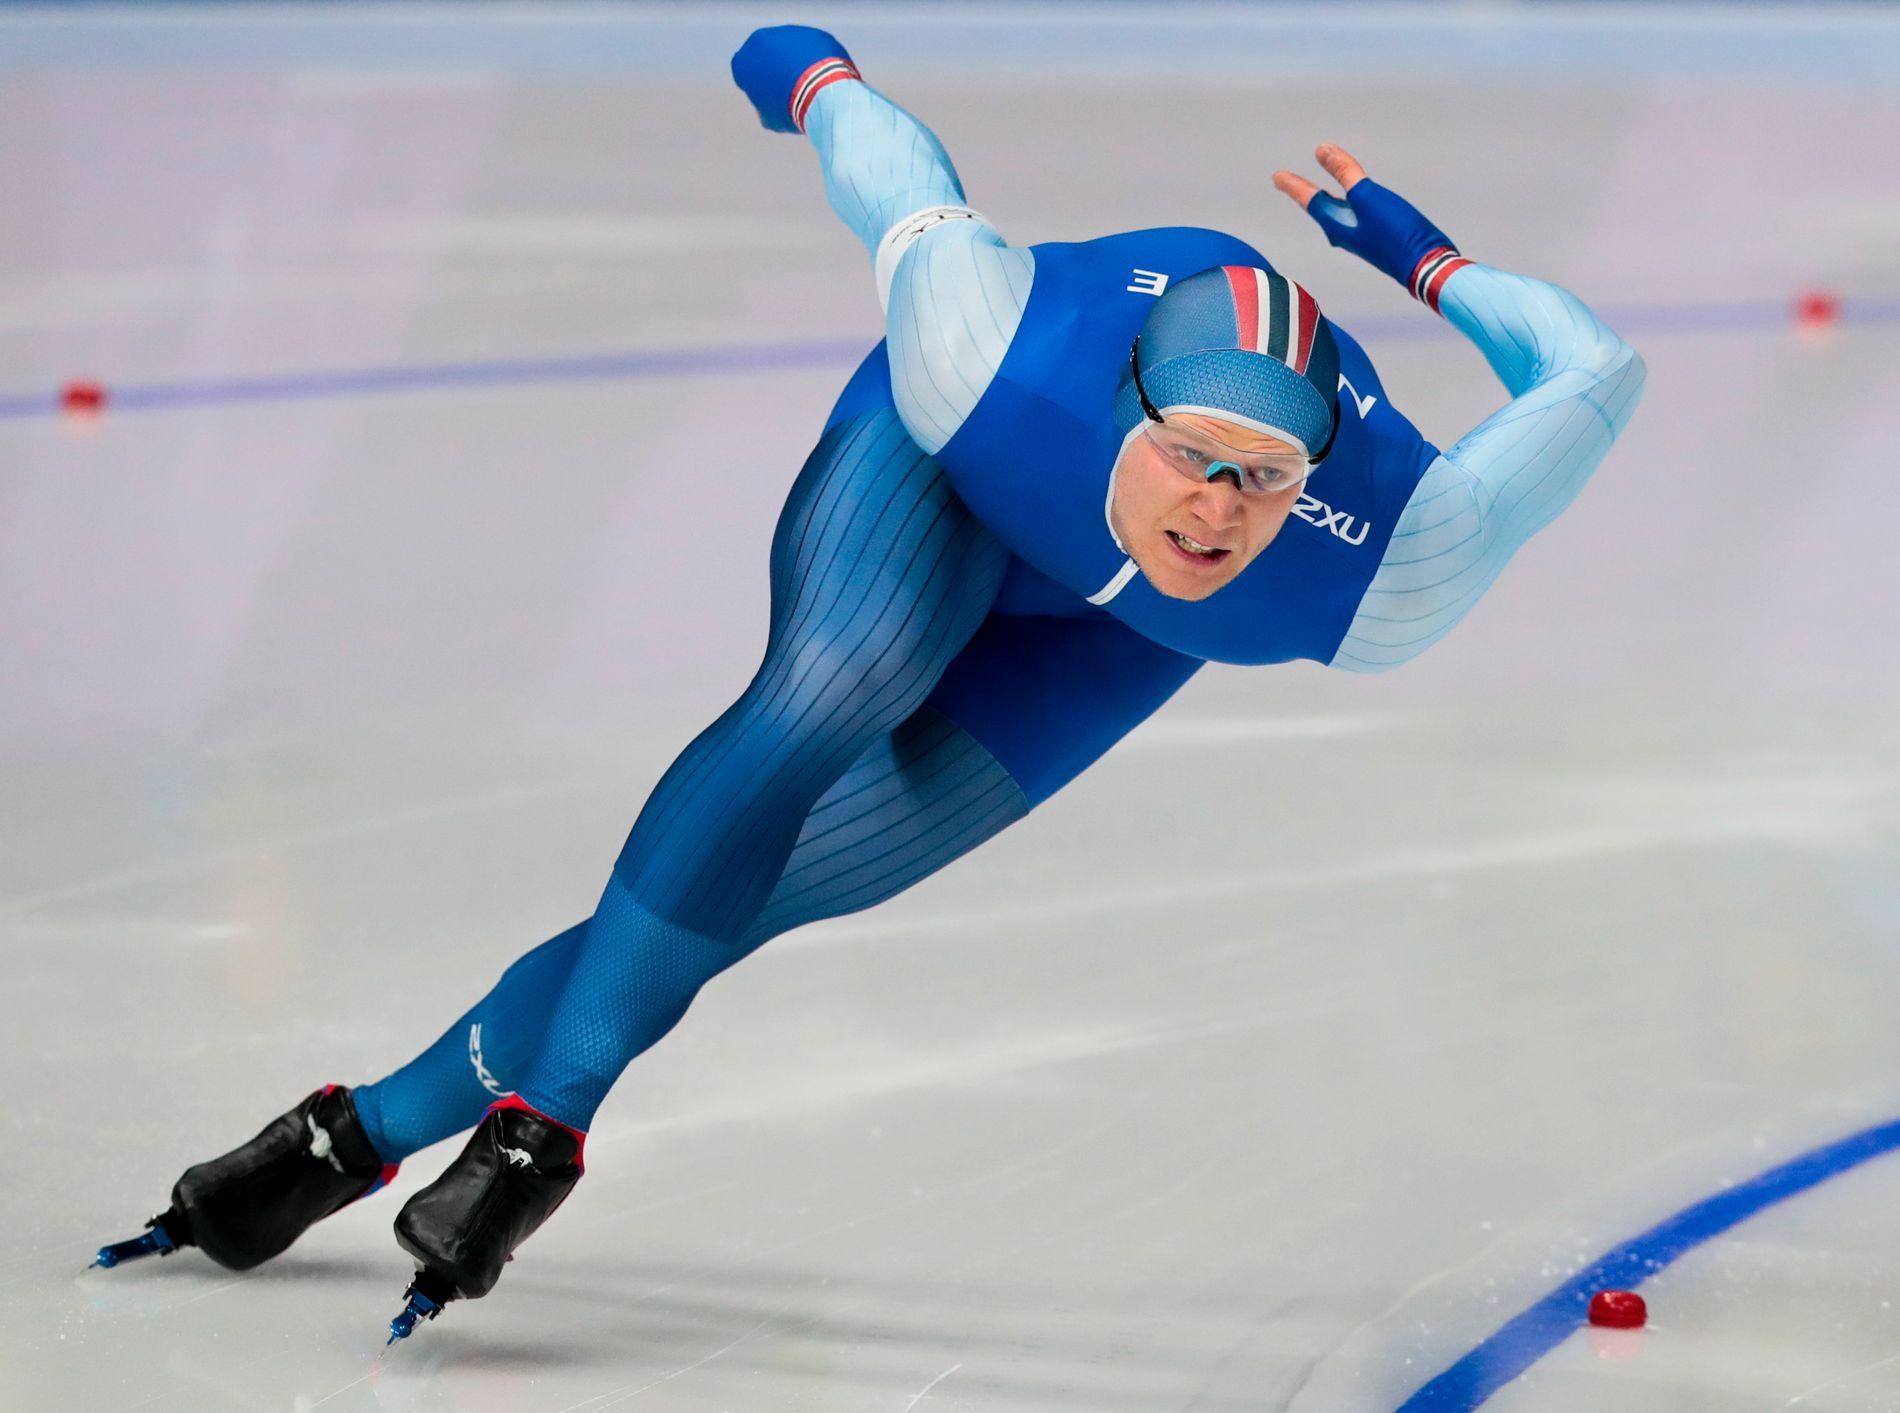 FJERDEPLASS: Håvard Holmefjord Lorentzen åpnet sprint-EM med fjerdeplass på 500 meter.